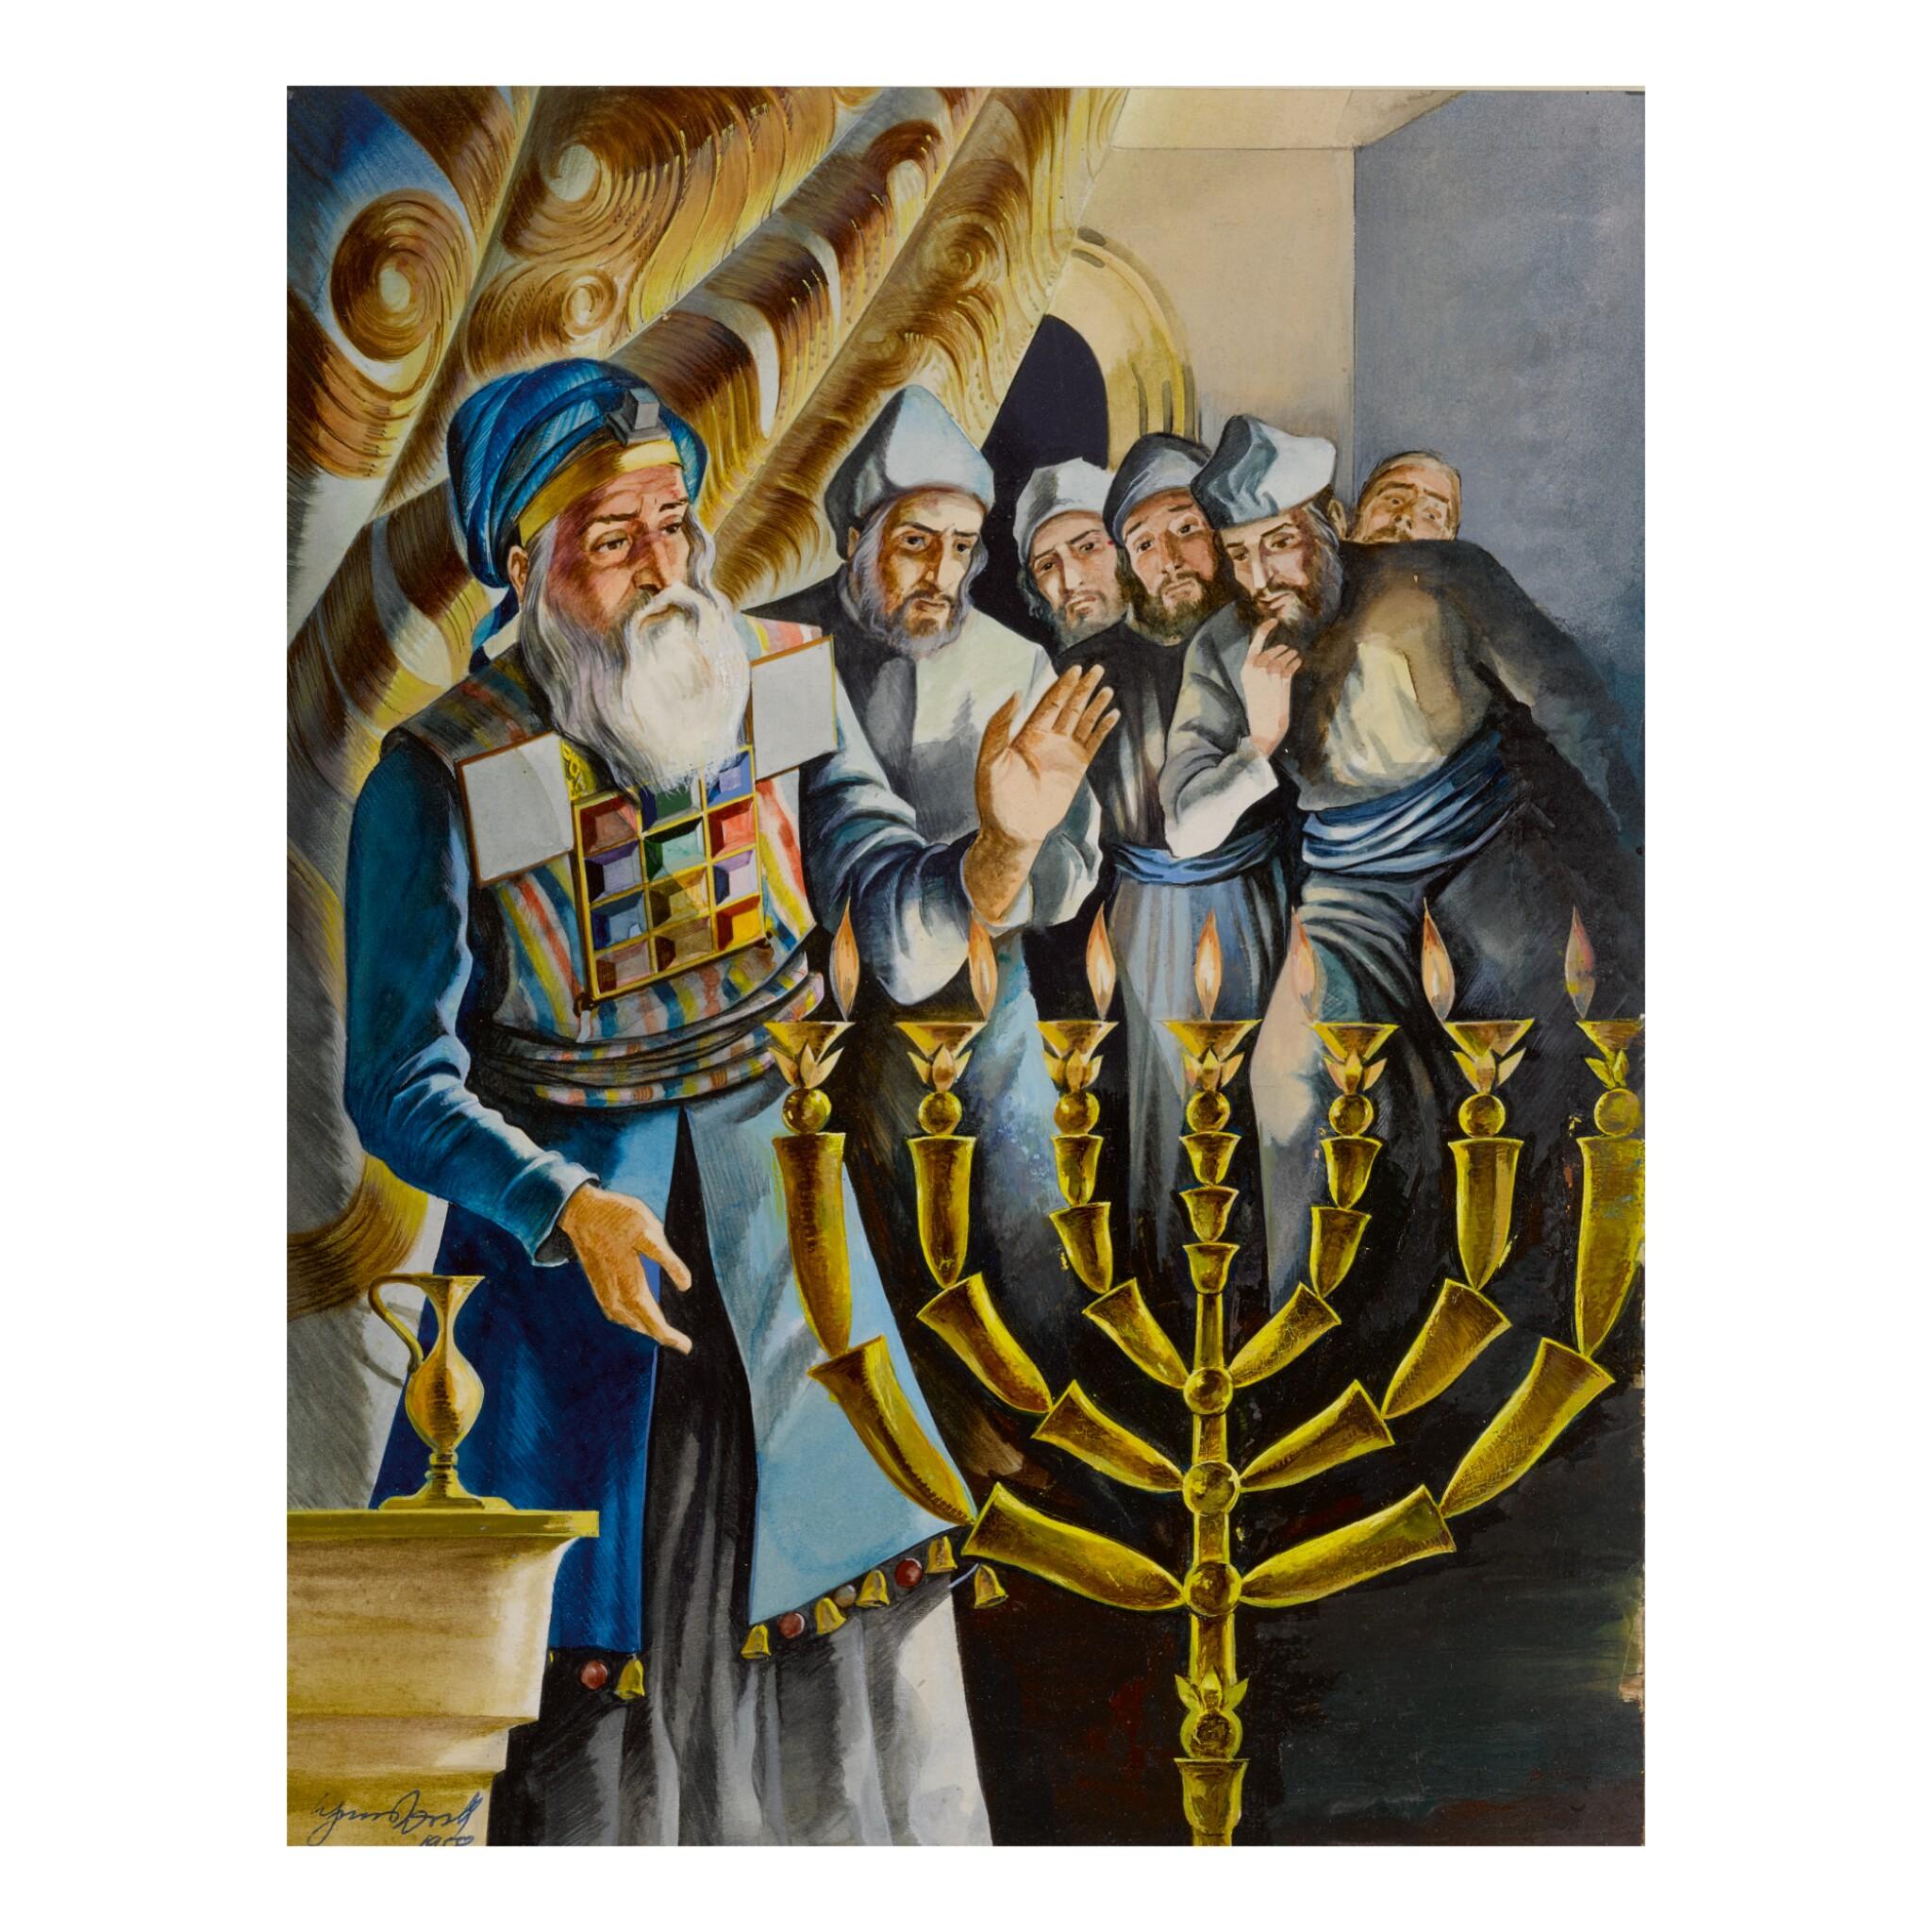 SIEGMUND FORST | REKINDLING THE MENORAH: AN ORIGINAL ILLUSTRATION FOR SAADYAH MAXIMON'S THE BOOK OF HANUKKAH